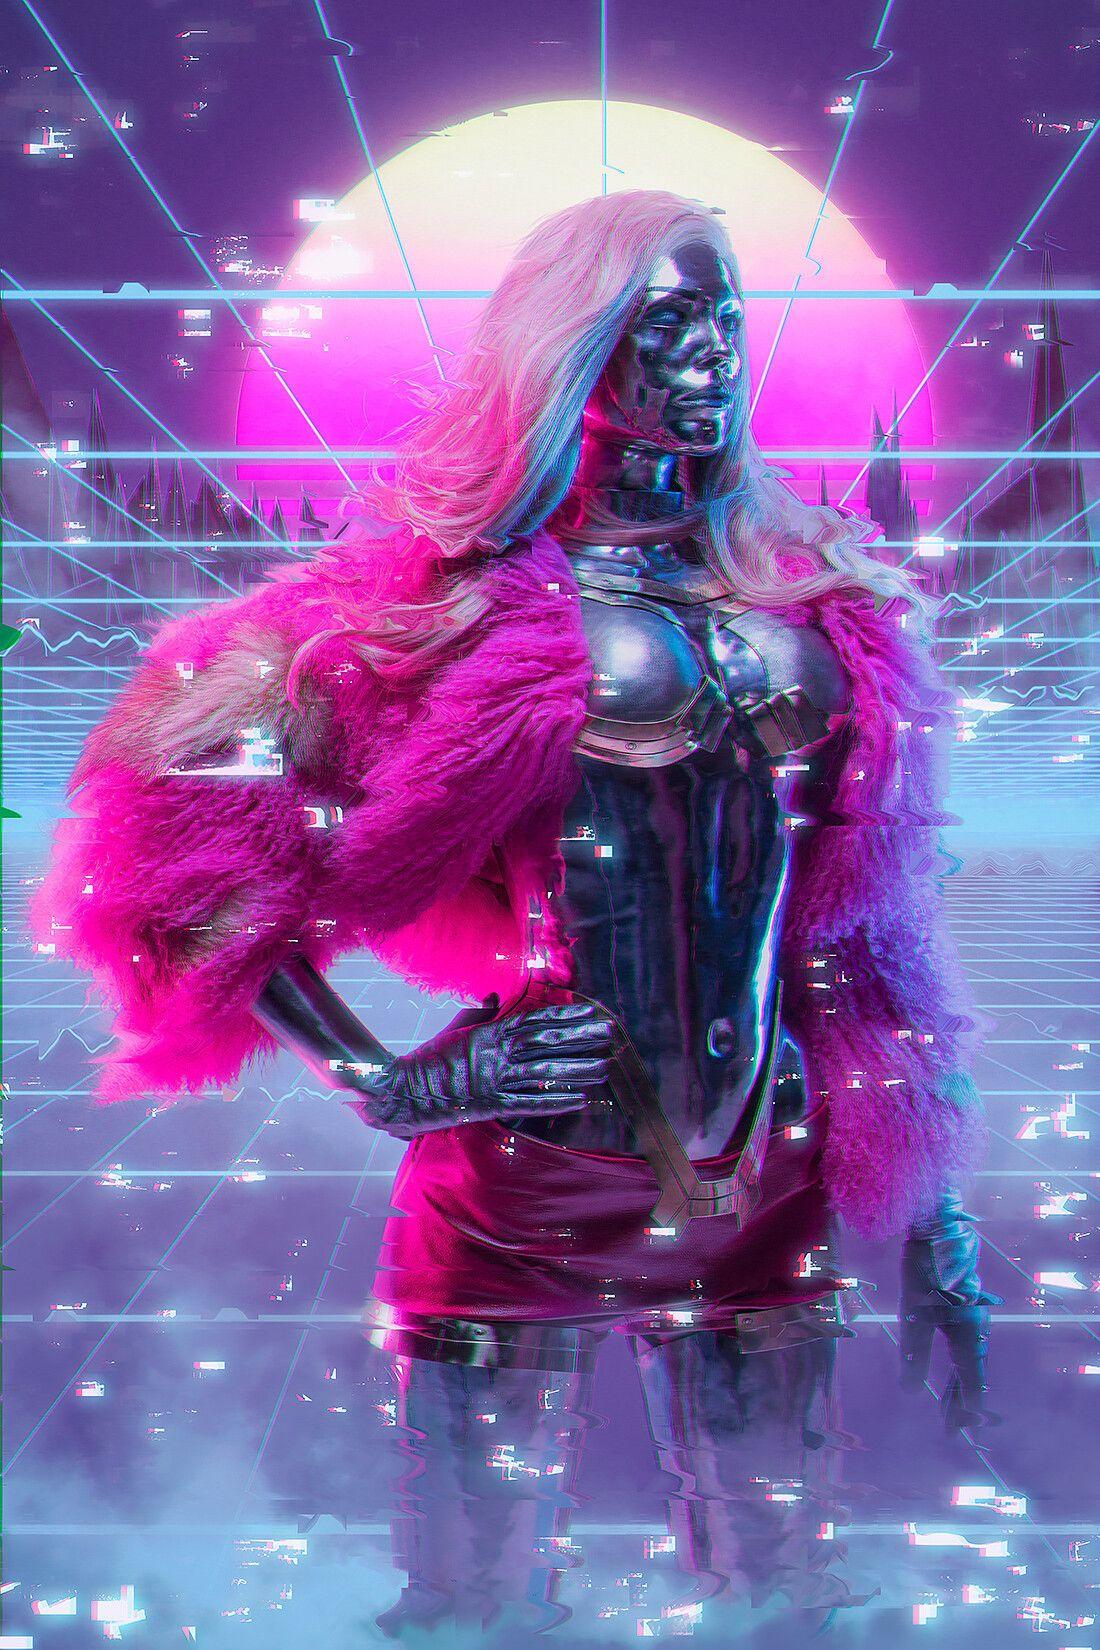 SKULLGRIND scififantasyhorror by Aku 悪 in 2020